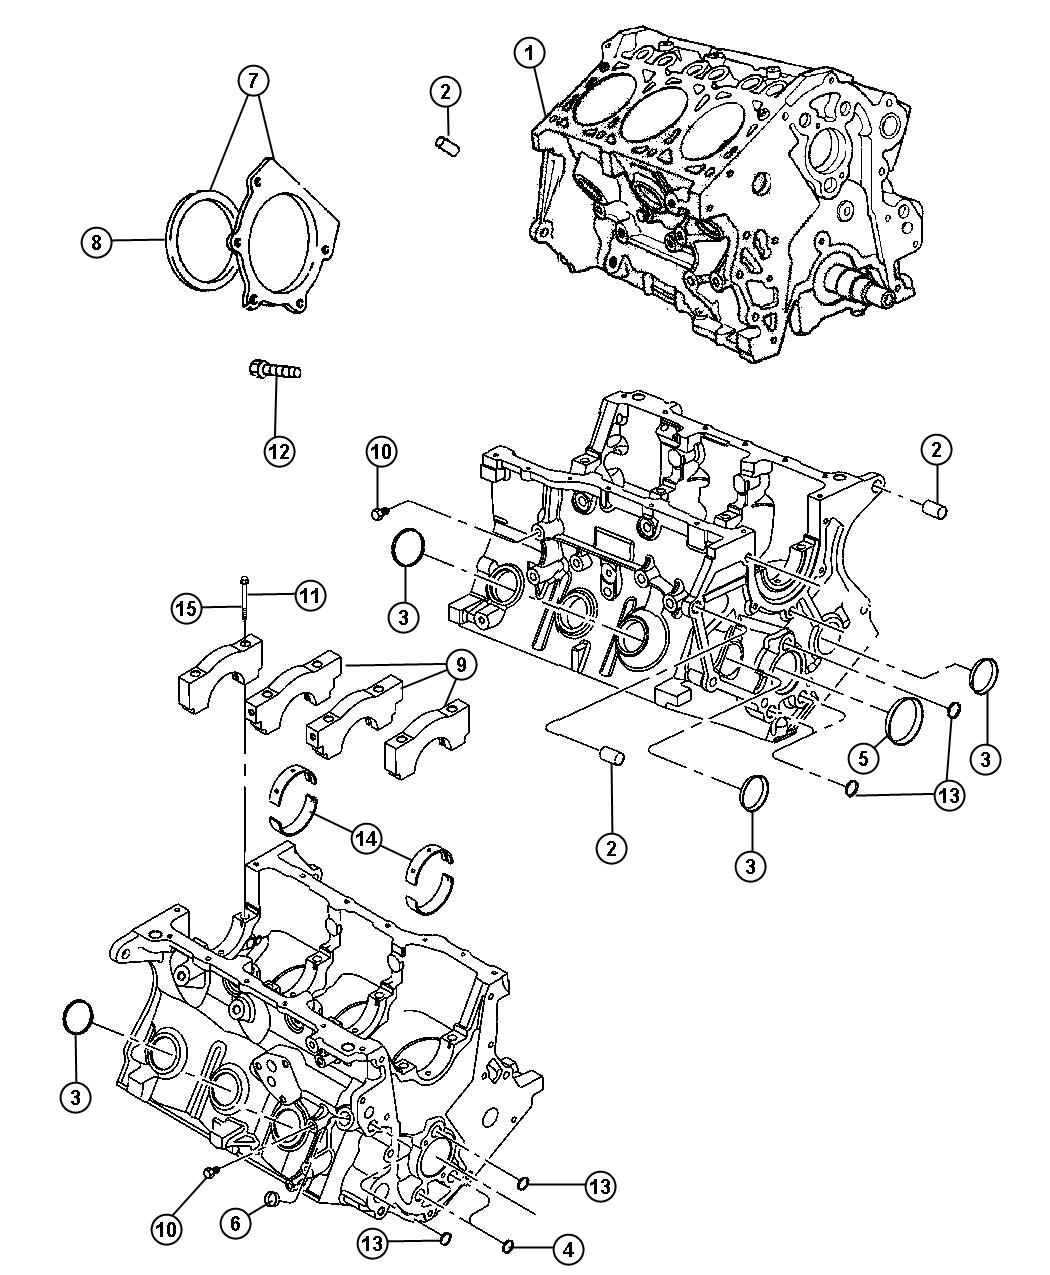 Dodge Grand Caravan Engine Short Block Tappet Bore